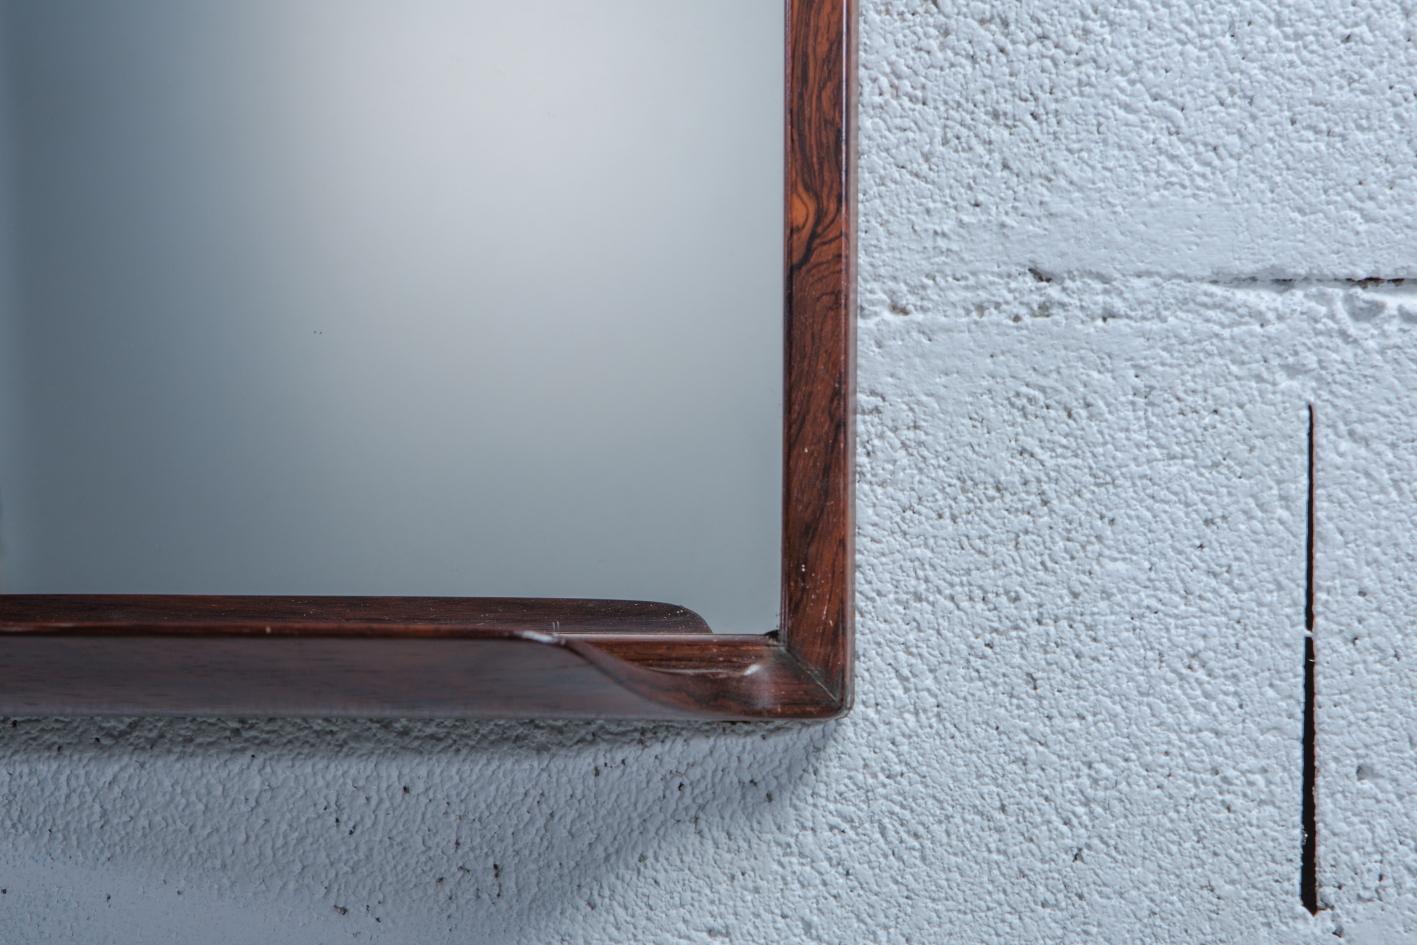 Rosewood Mirror by Uno & Östen Kristiansson for Luxus - Wood grain detail